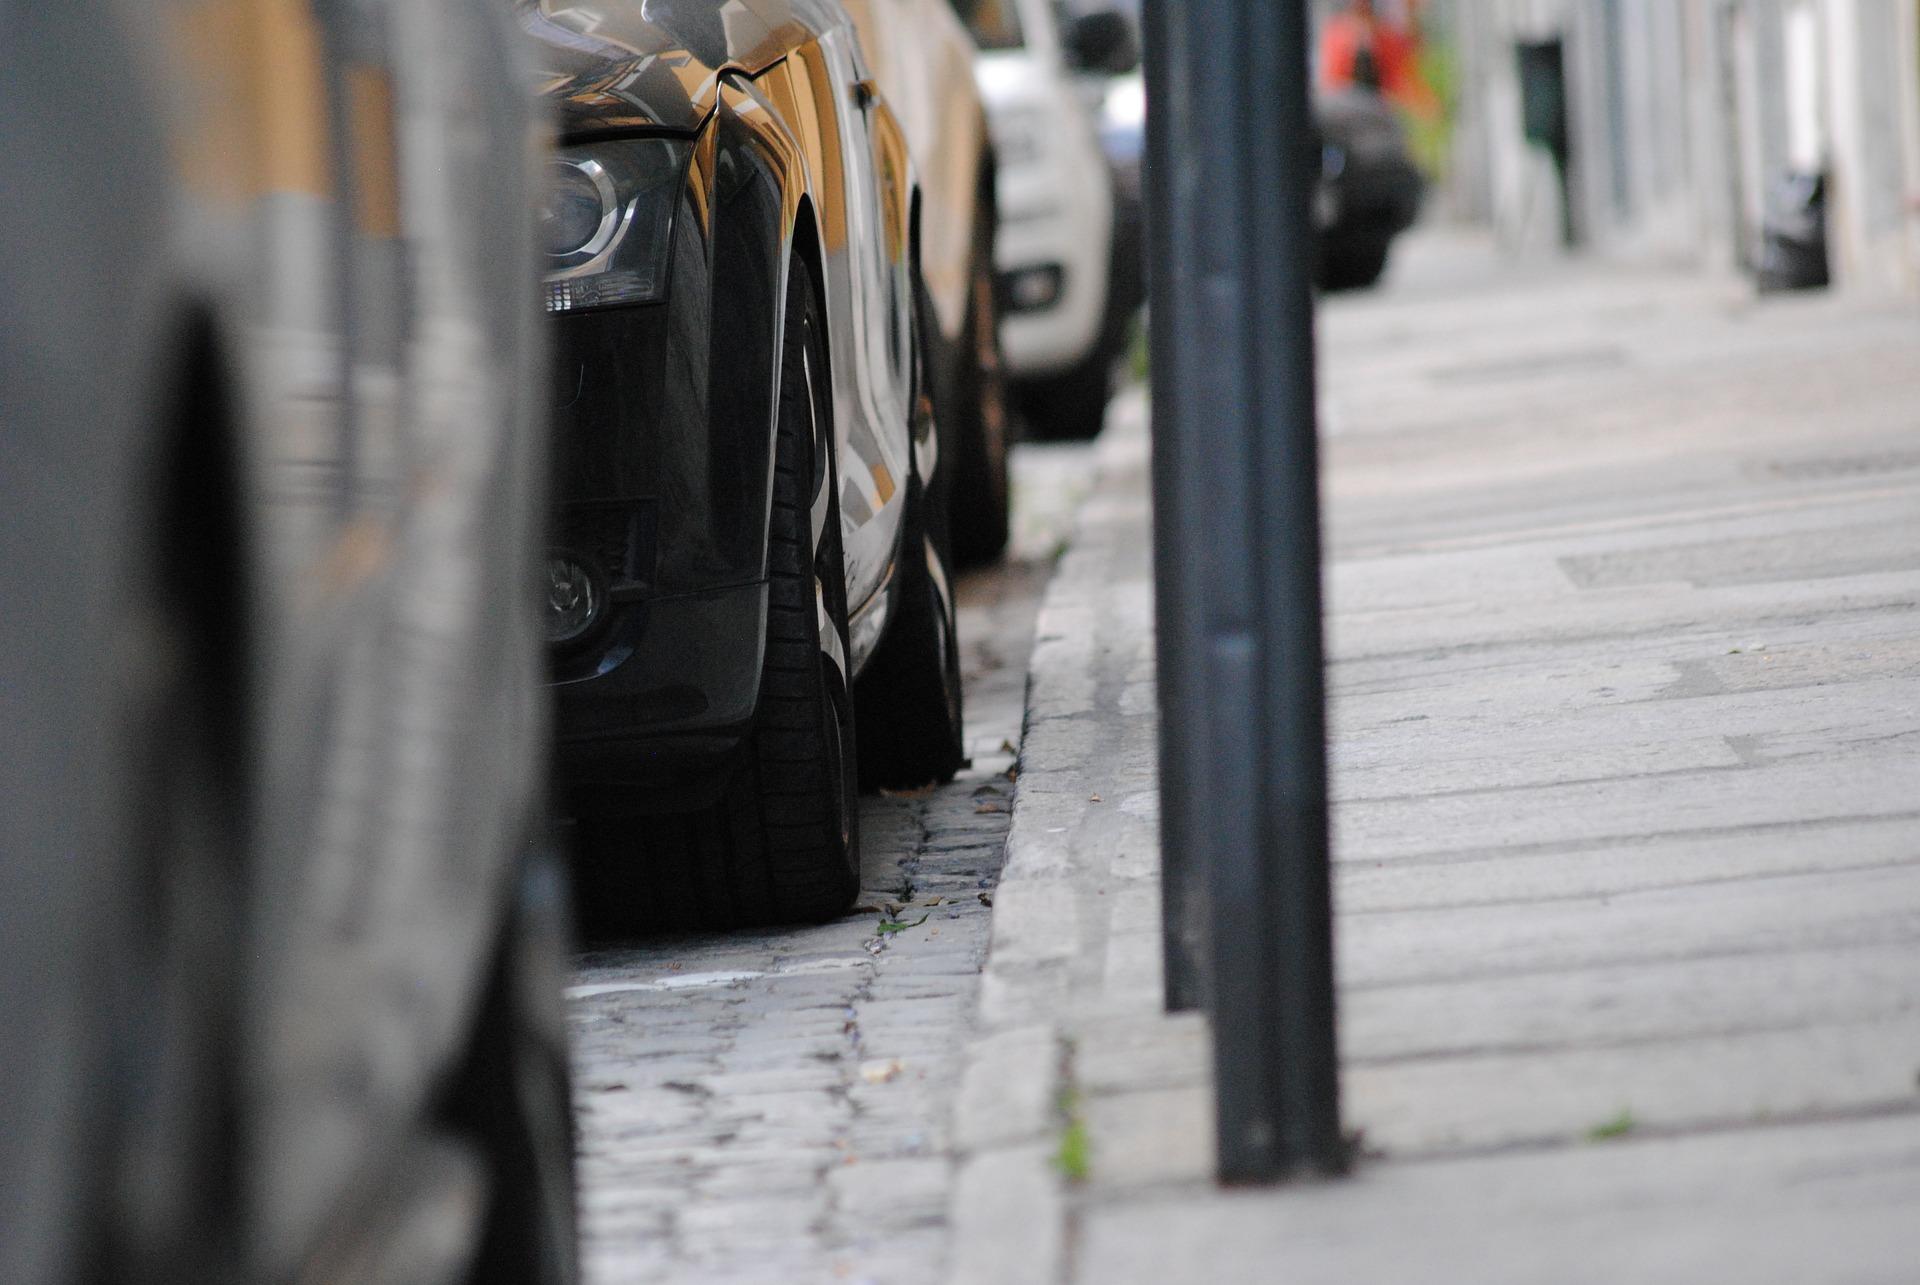 pavement parking.jpg (451 KB)